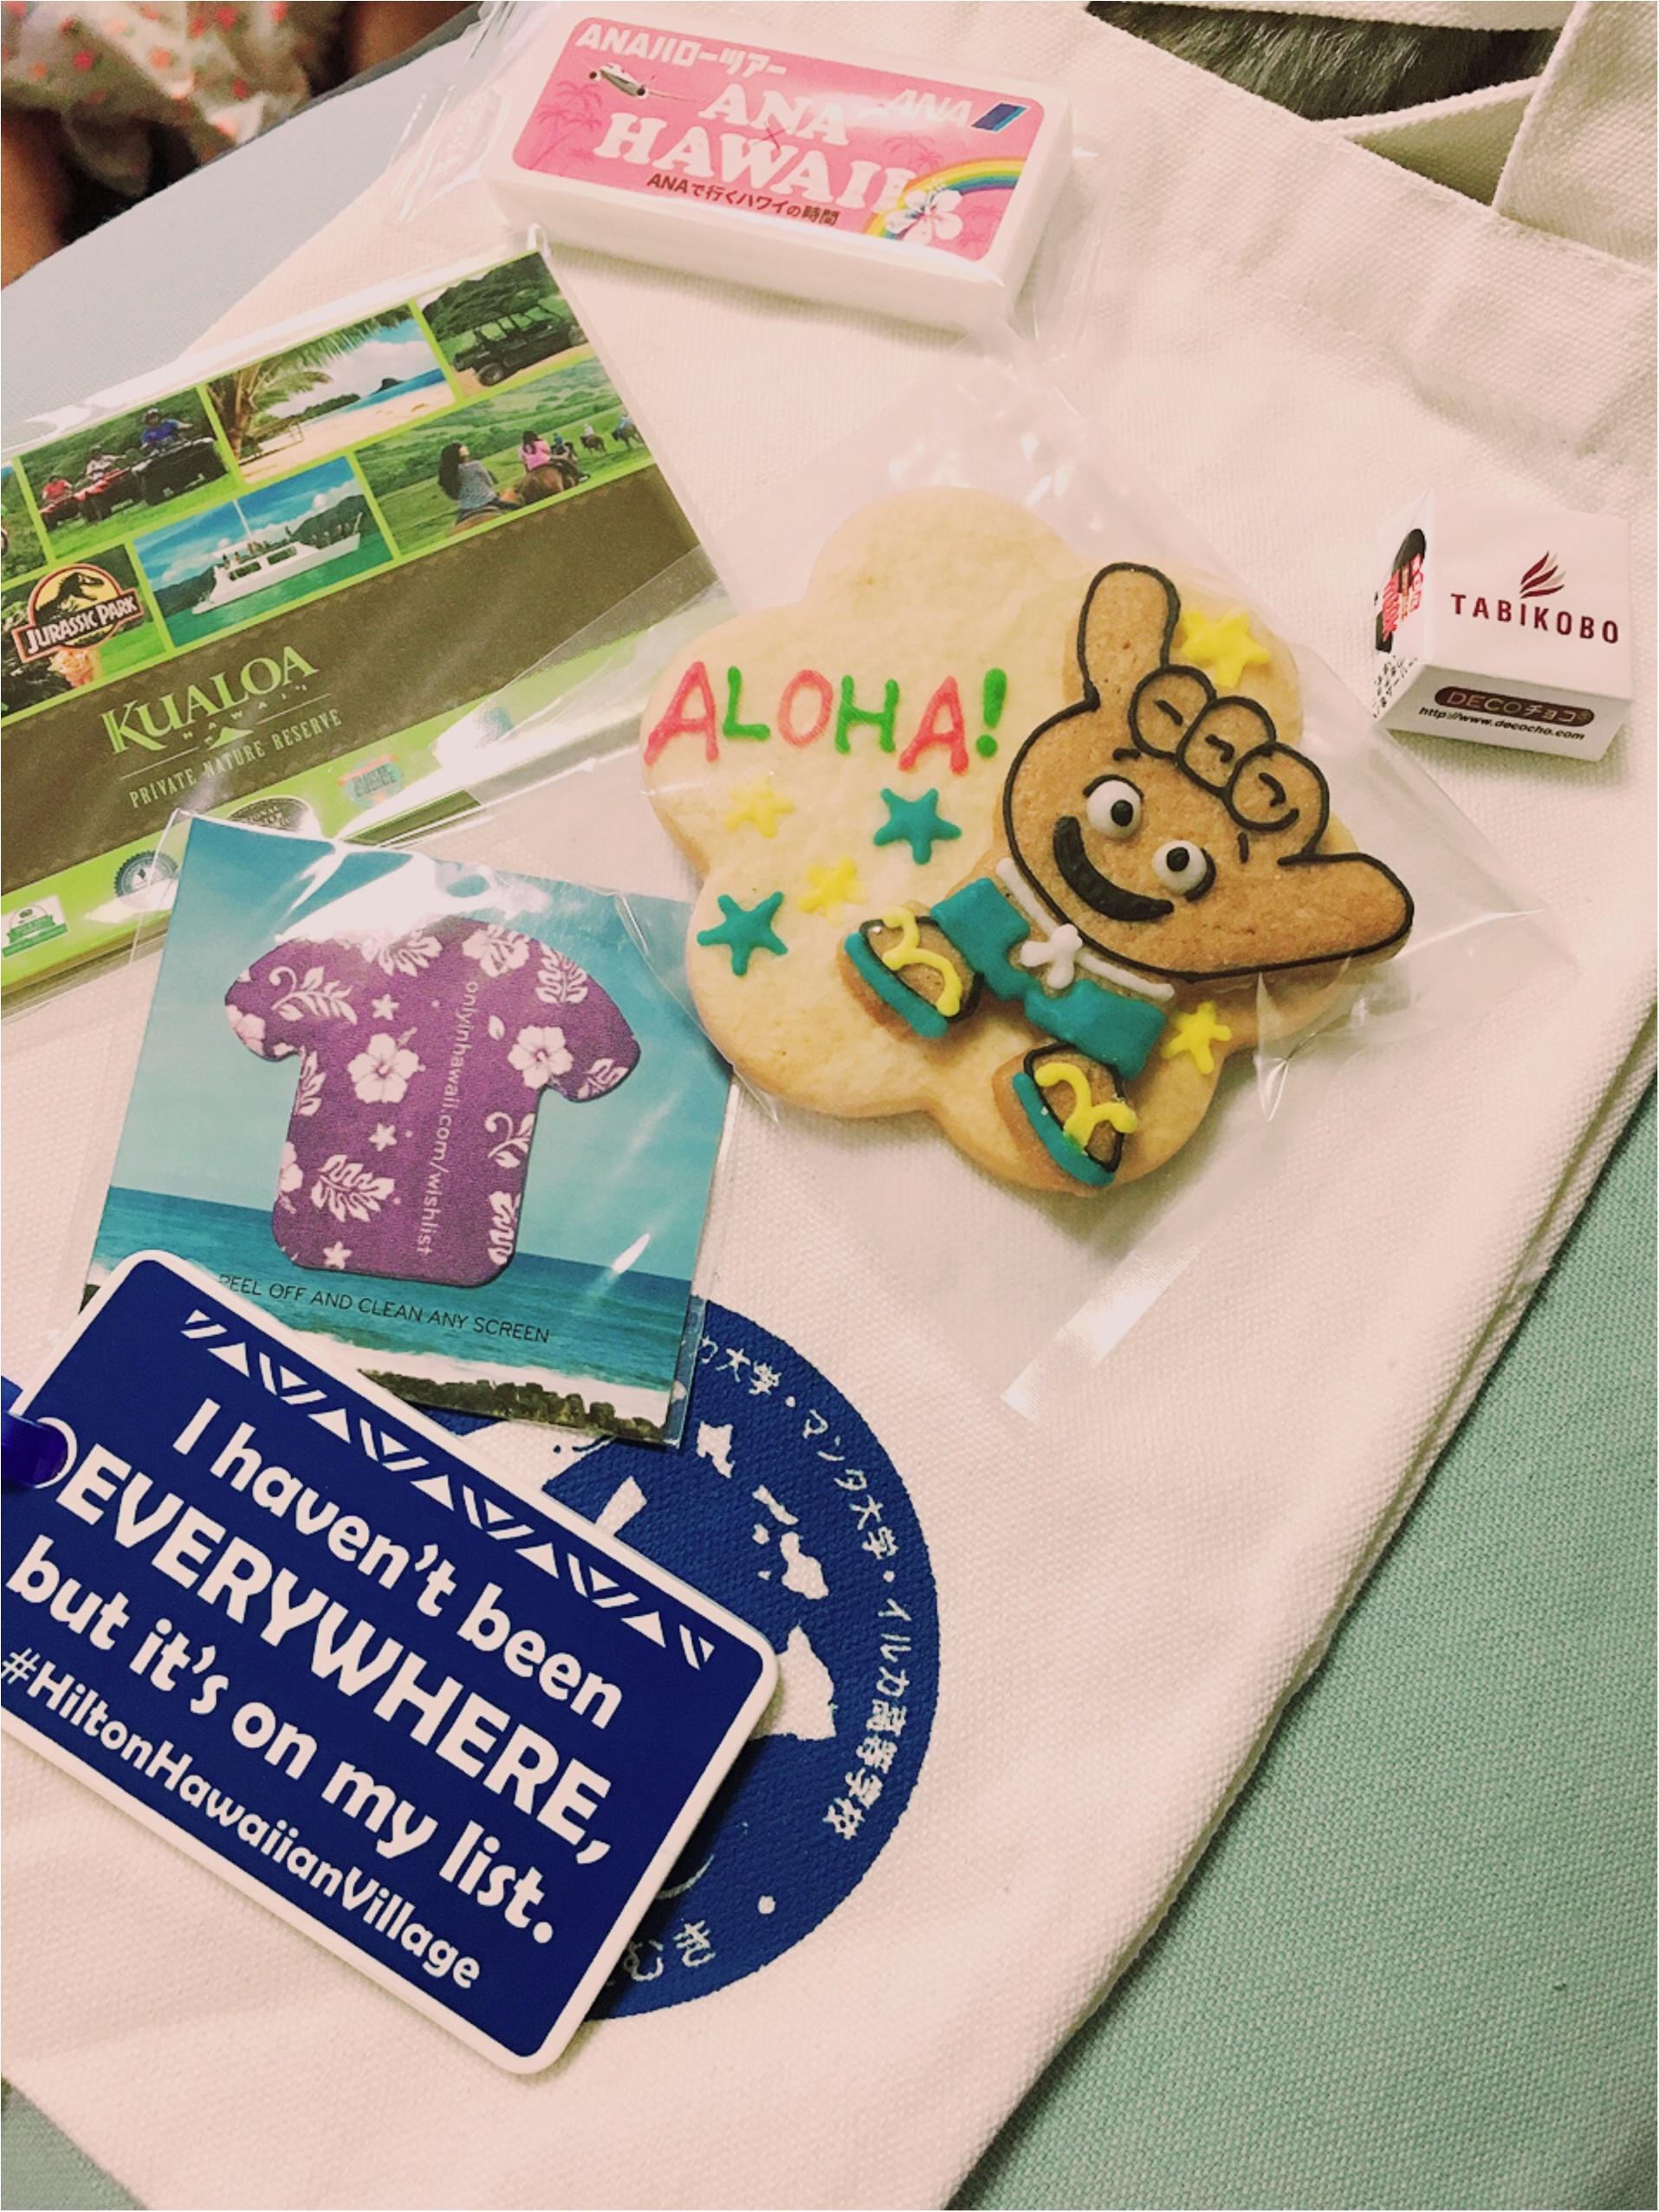 HAWAII EXPO 2016 渋谷ヒカリエで開催中♡byじゅな_5